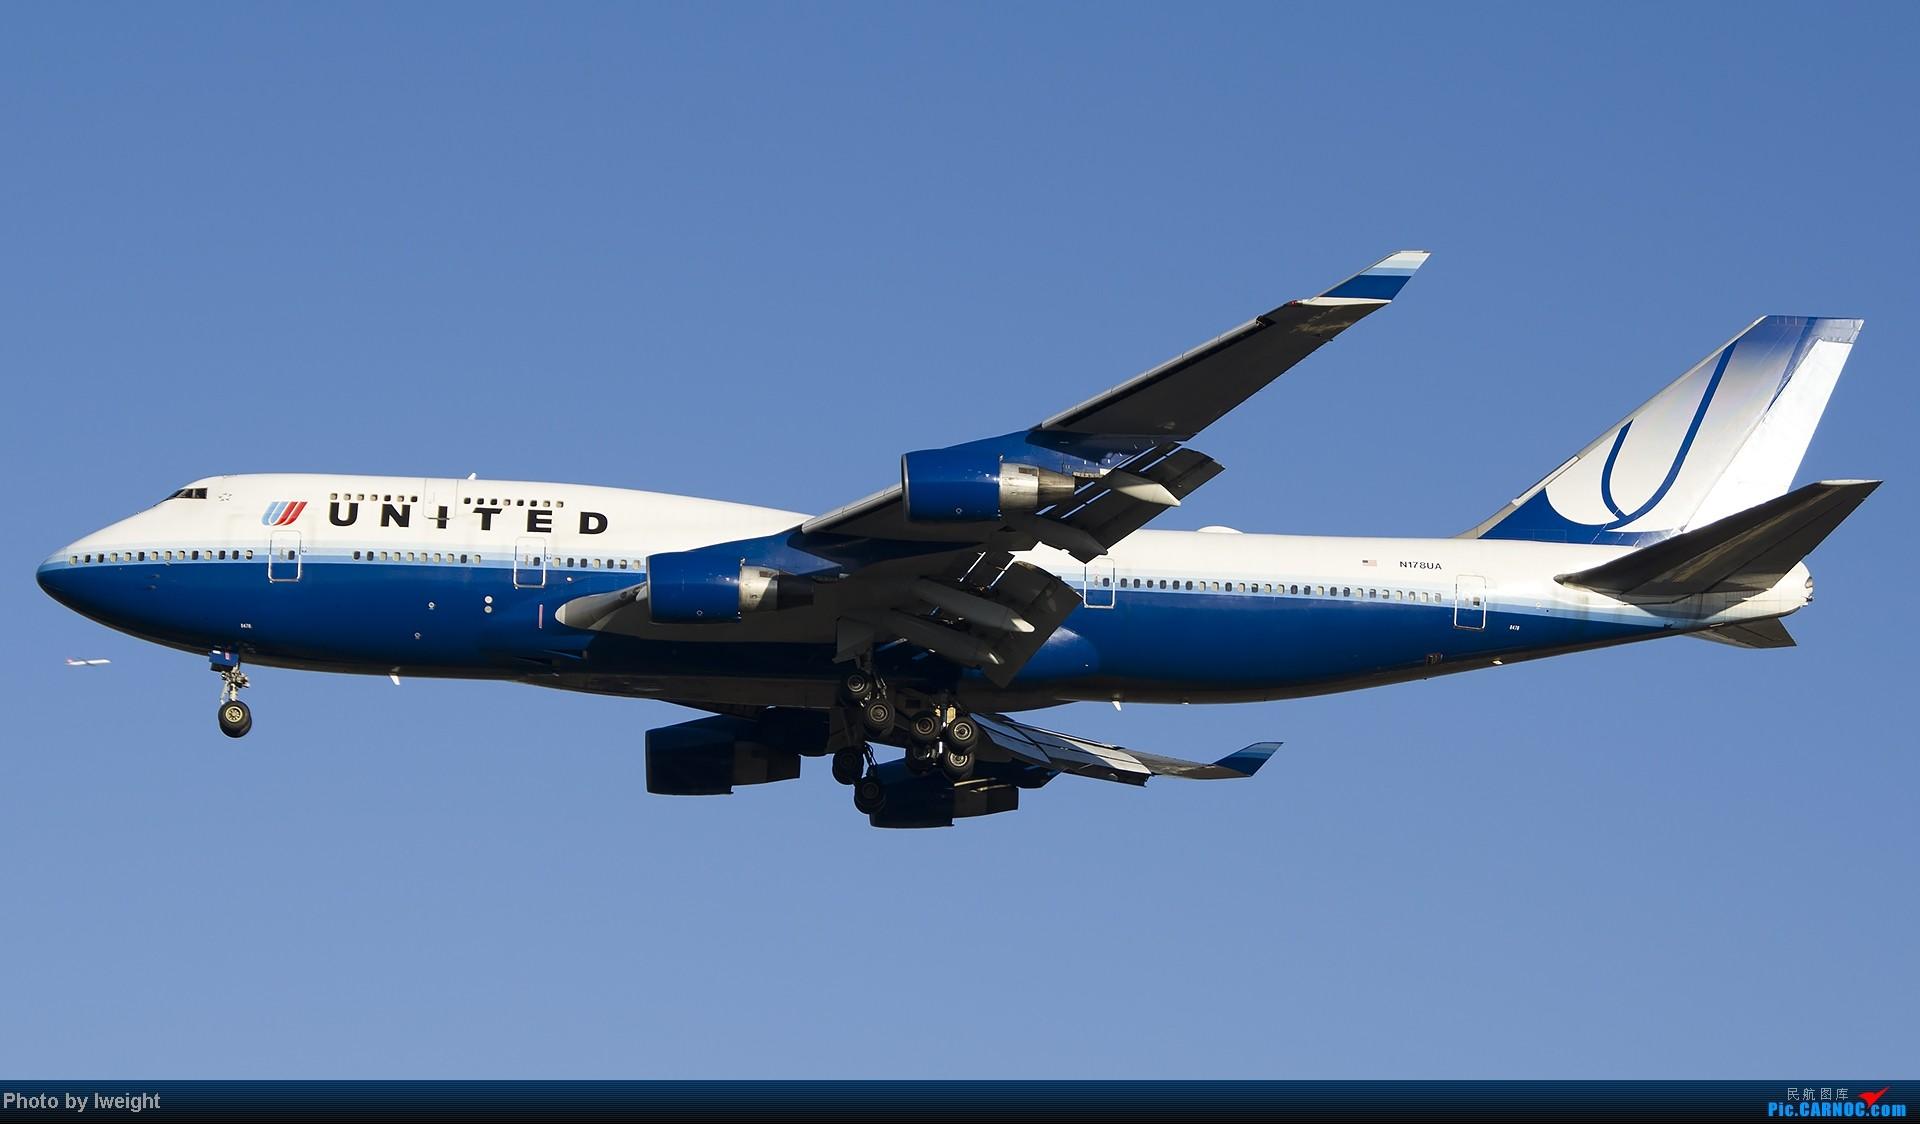 Re:[原创]抓住APEC蓝的尾巴,再拍上一组 BOEING 747-400 N178UA 中国北京首都机场